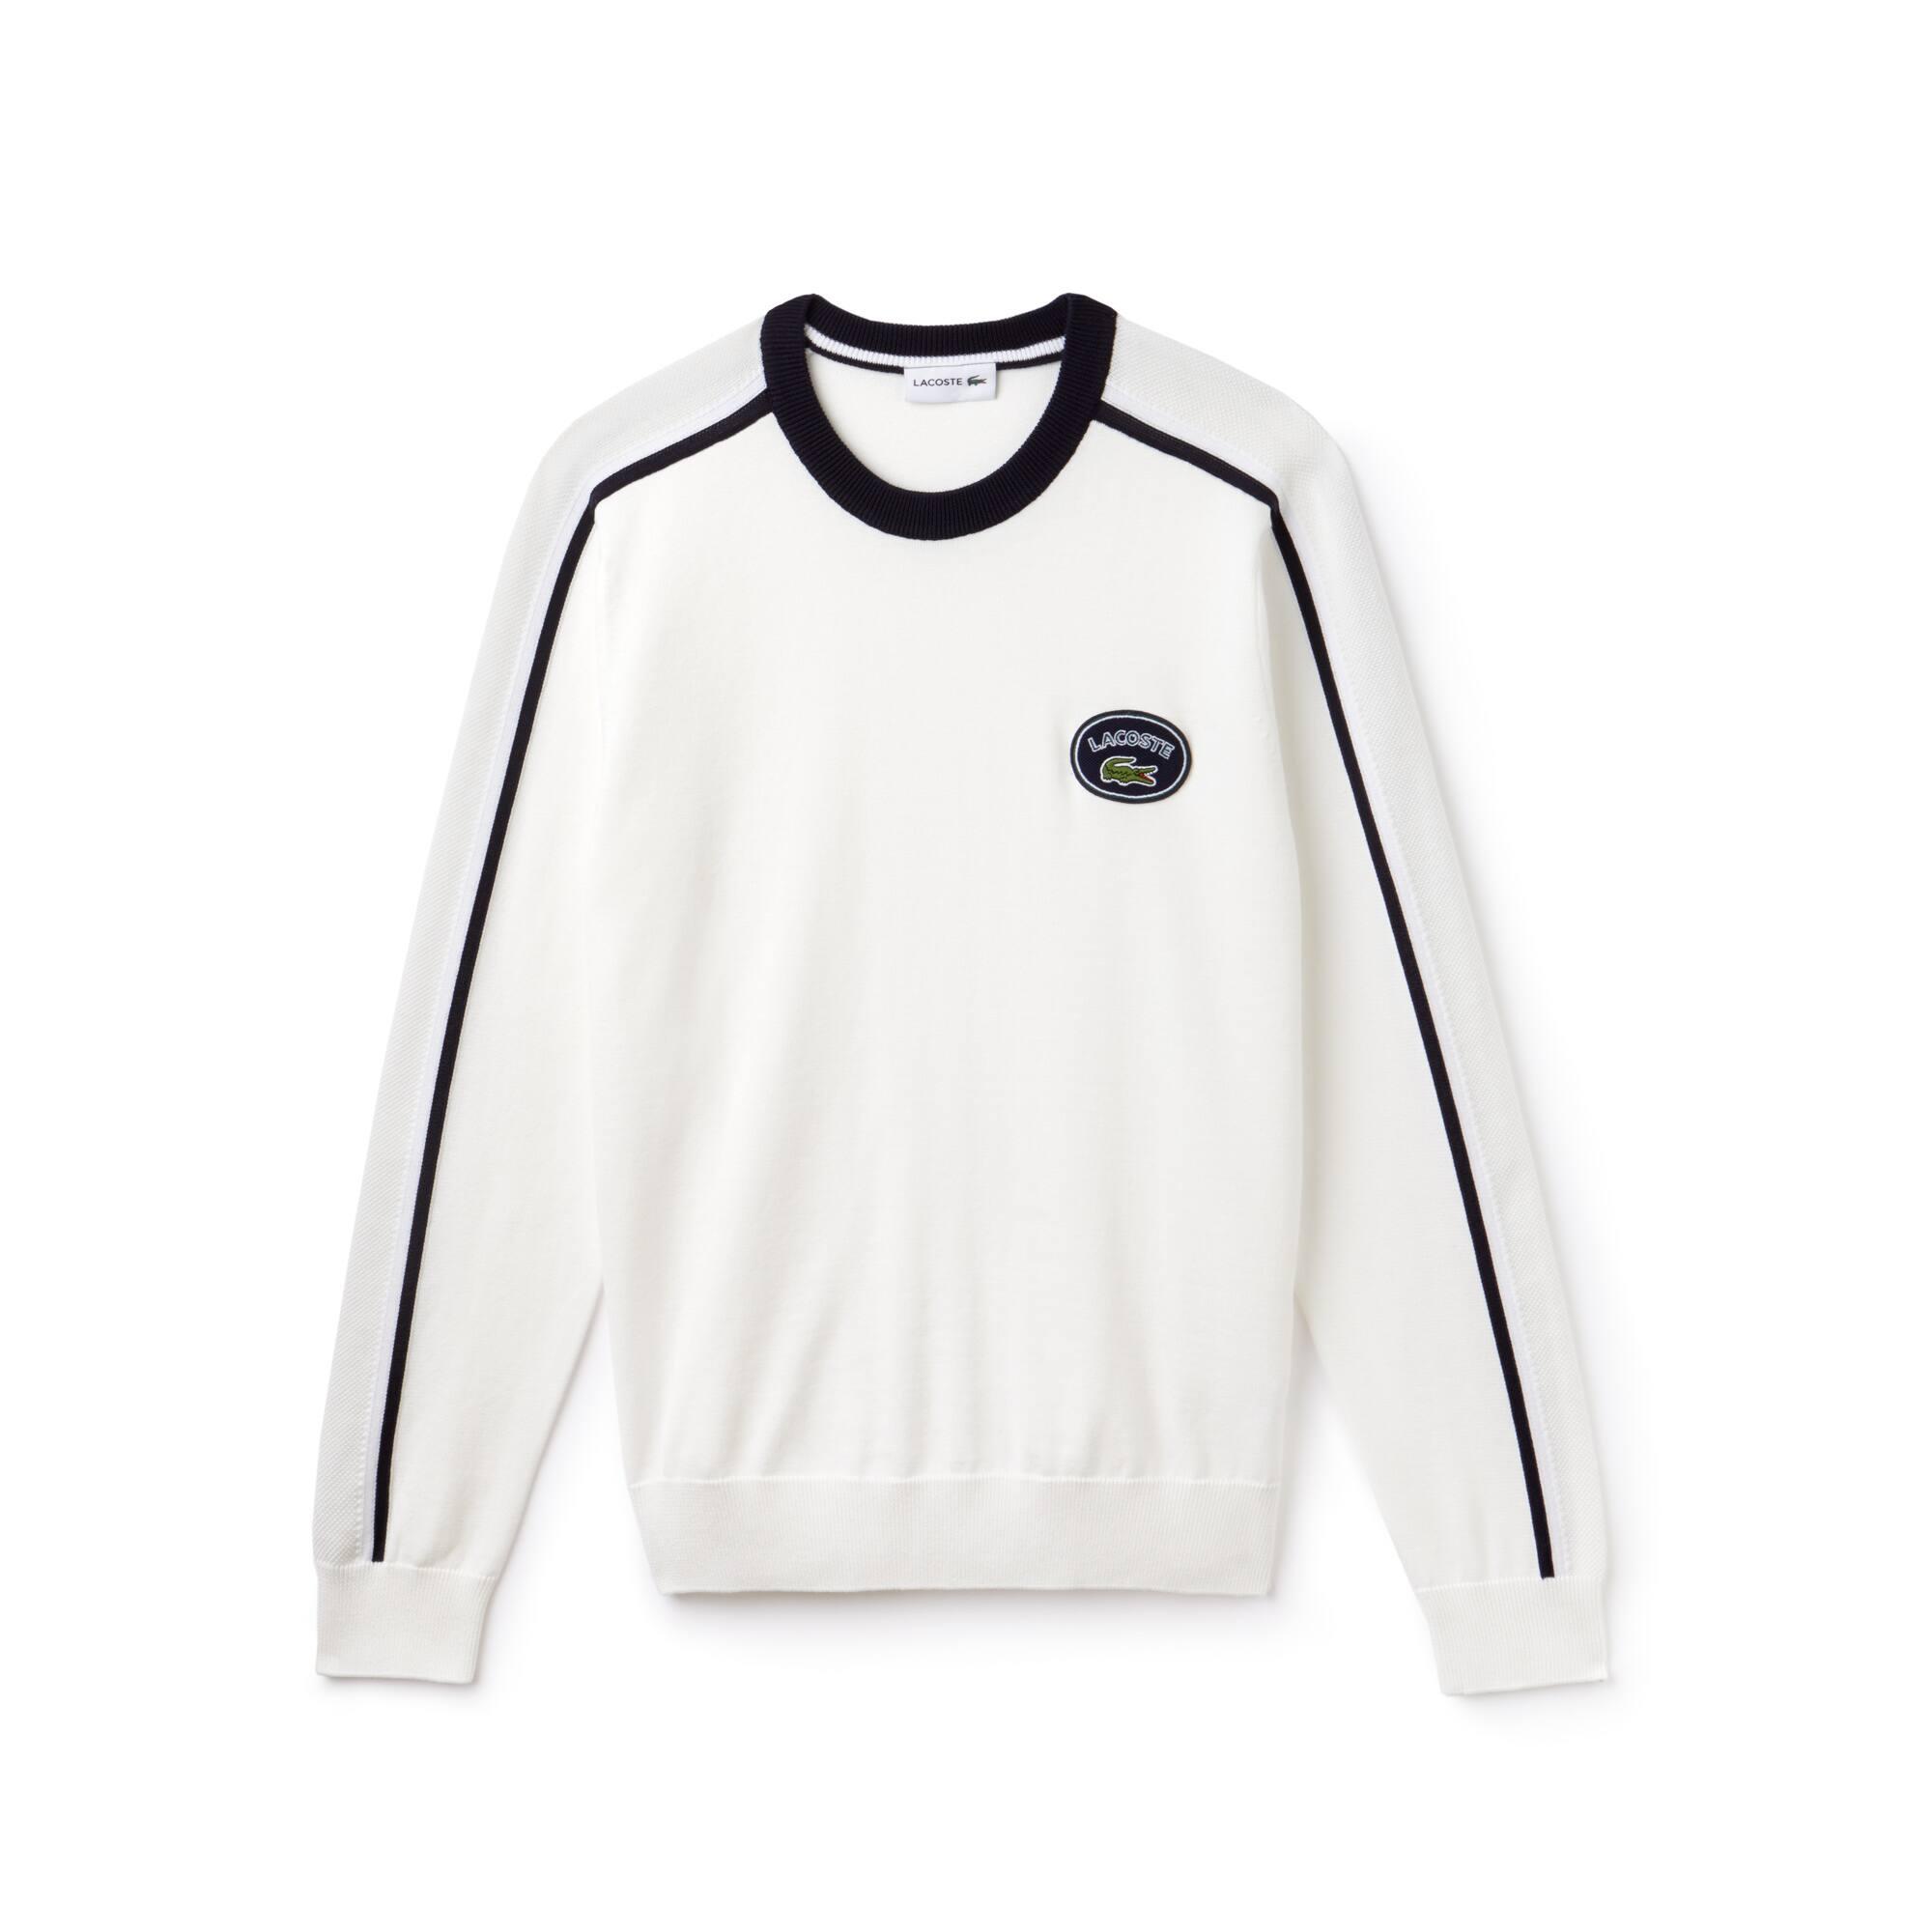 Men's Crew Neck Contrast Accents Cotton Jersey Sweater